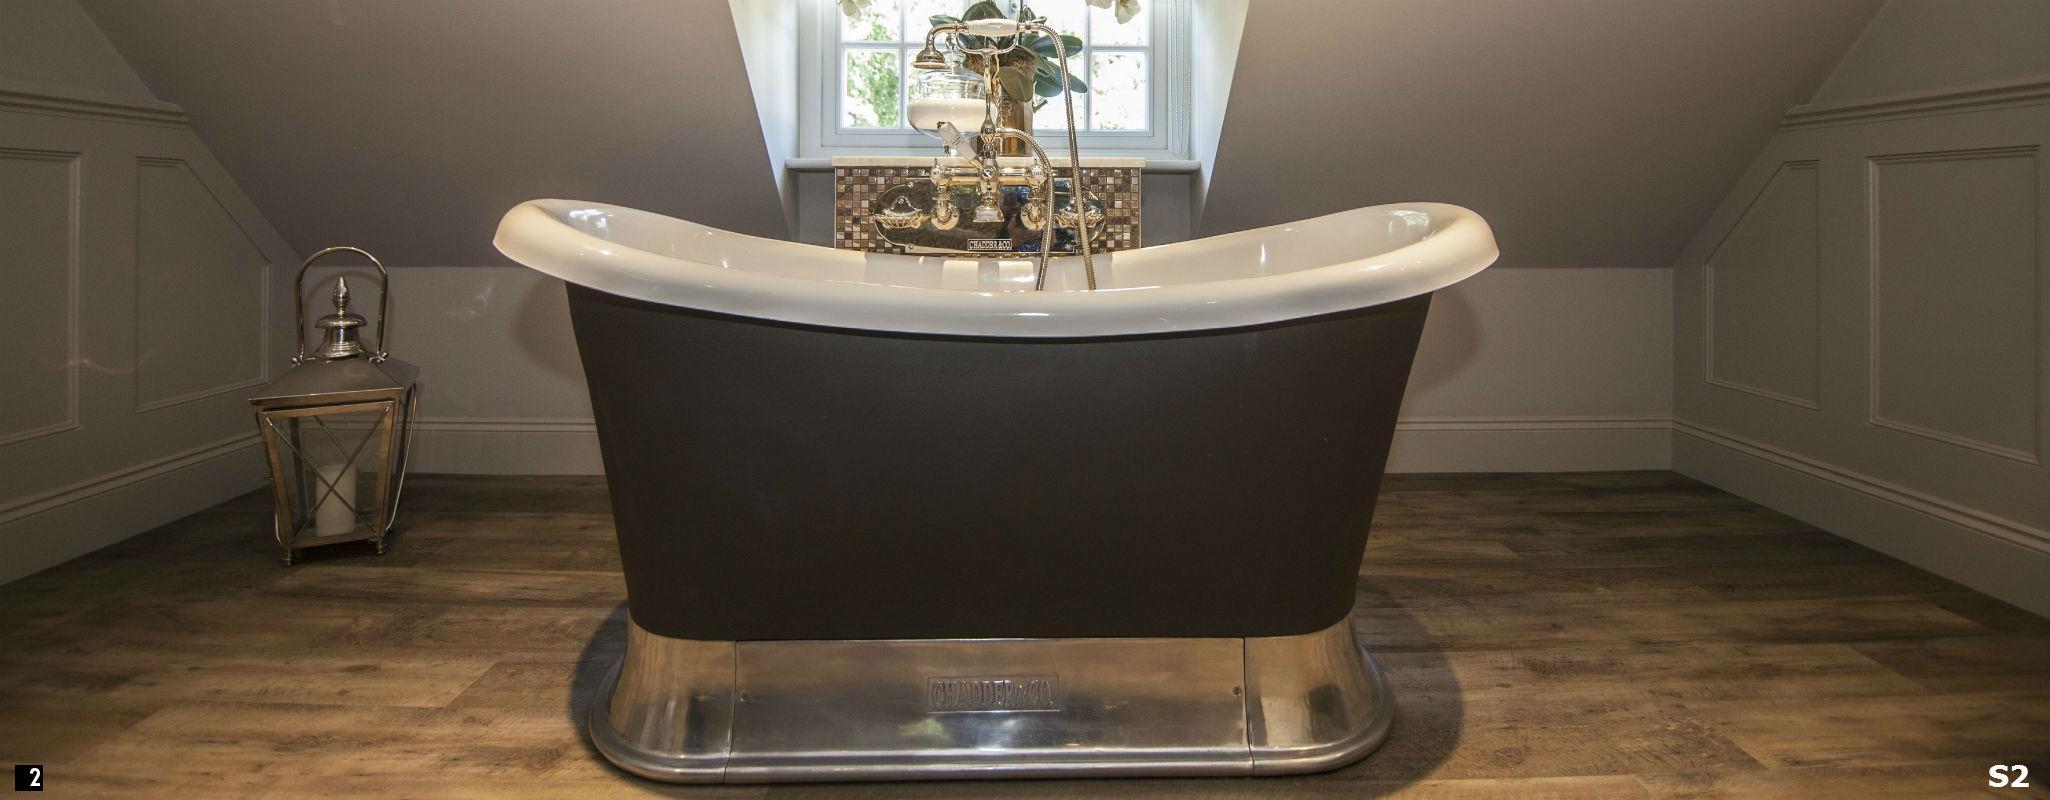 Bespoke Toilet and Bespoke Cisterns, Luxury Bespoke Bathroom